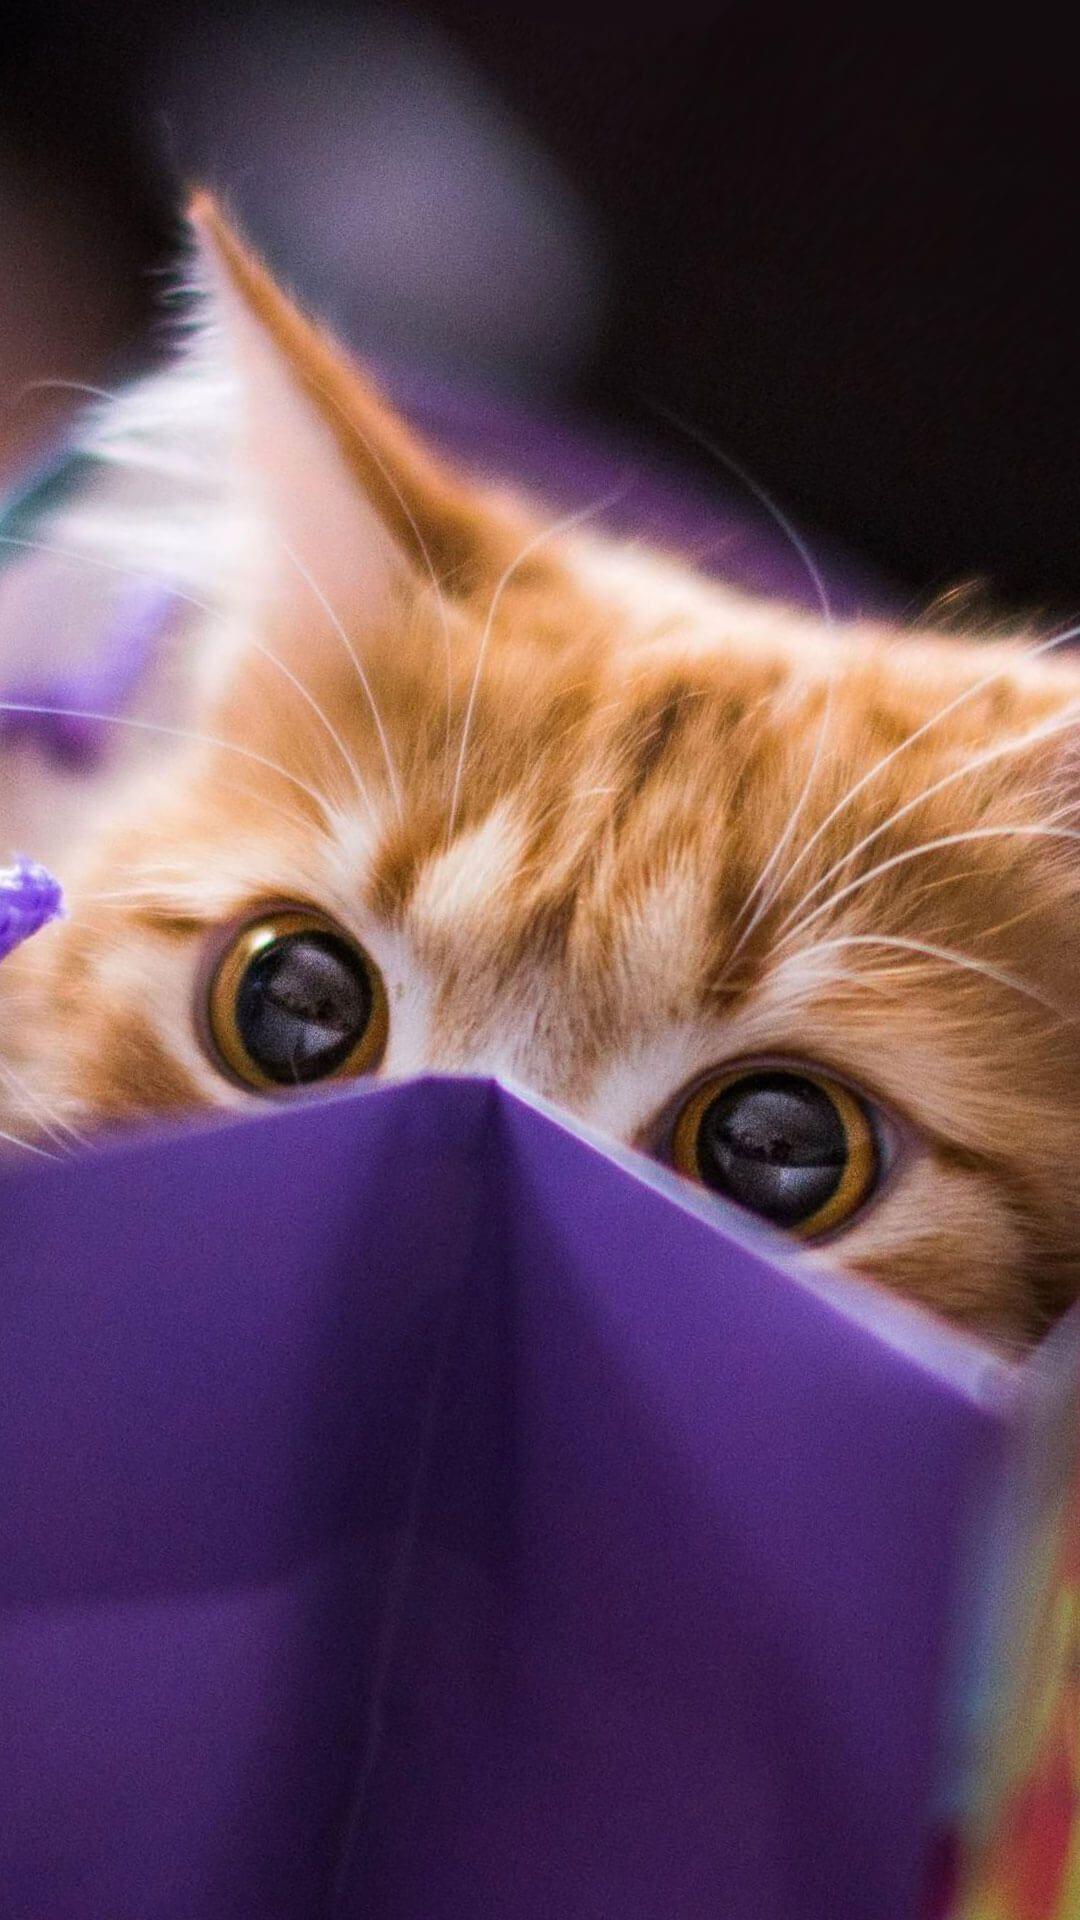 purple cat aesthetic wallpapers